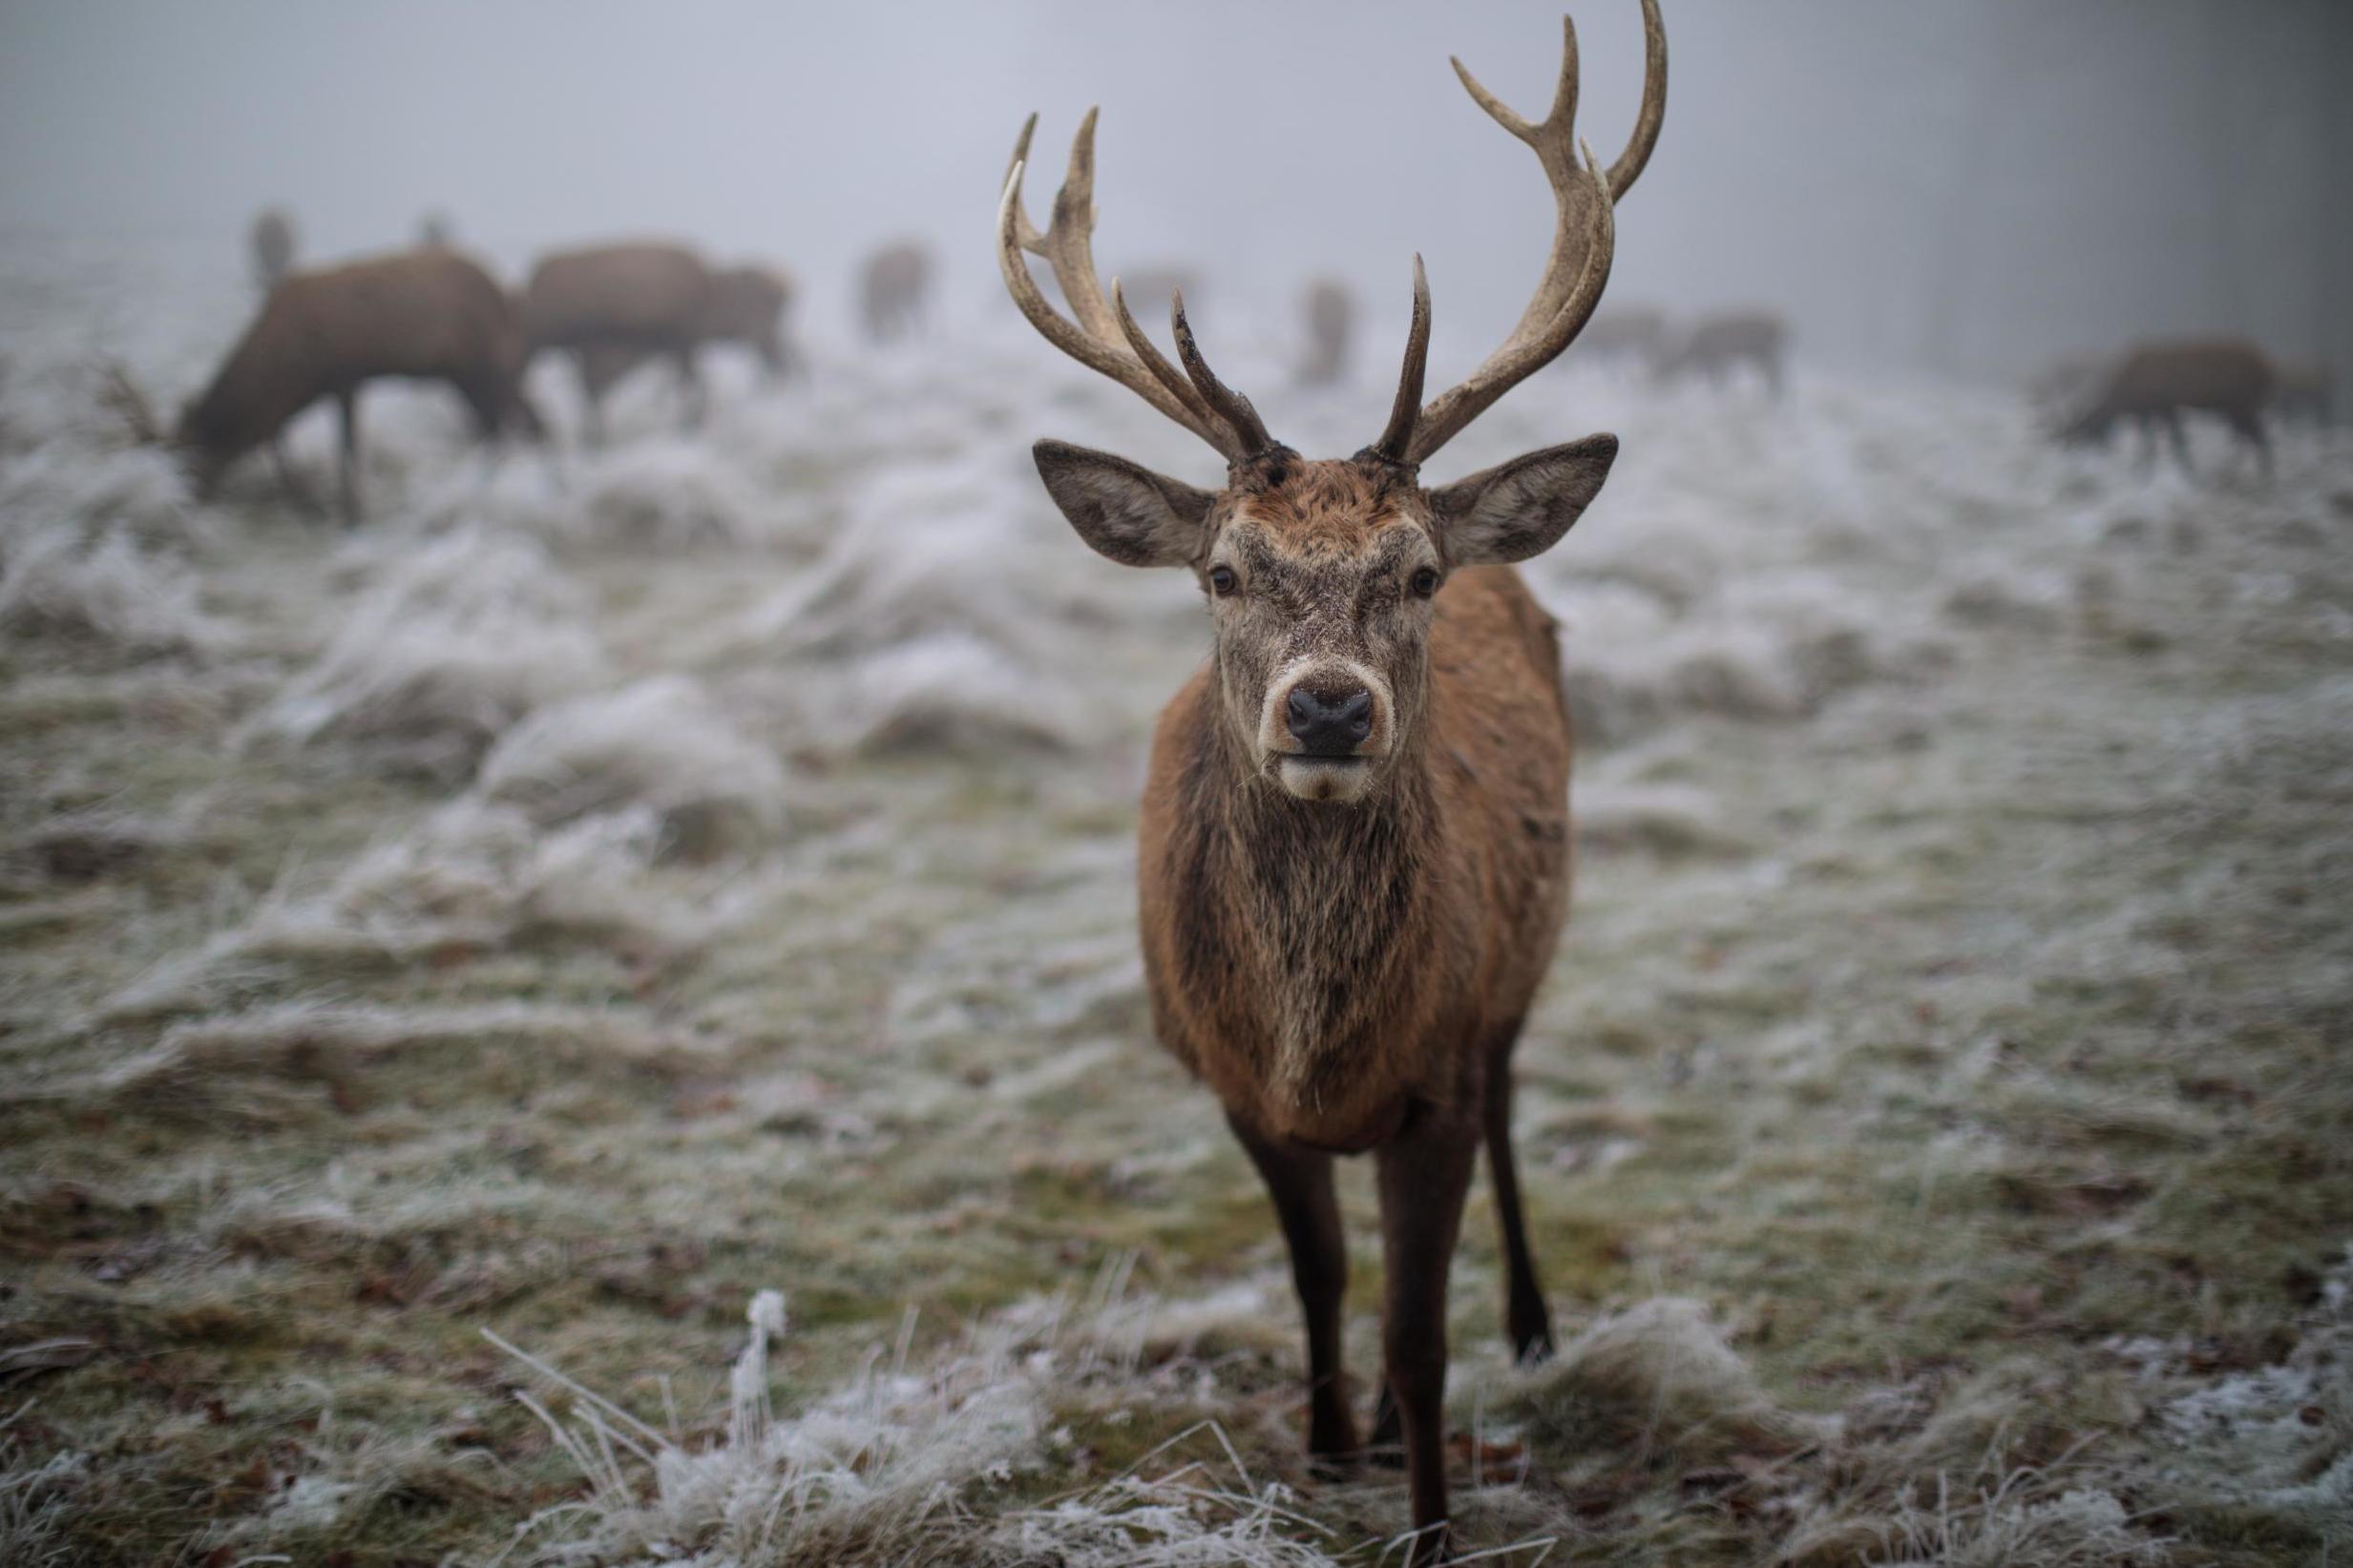 UK weather forecast: Britain set to freeze as temperatures plummet to -10C